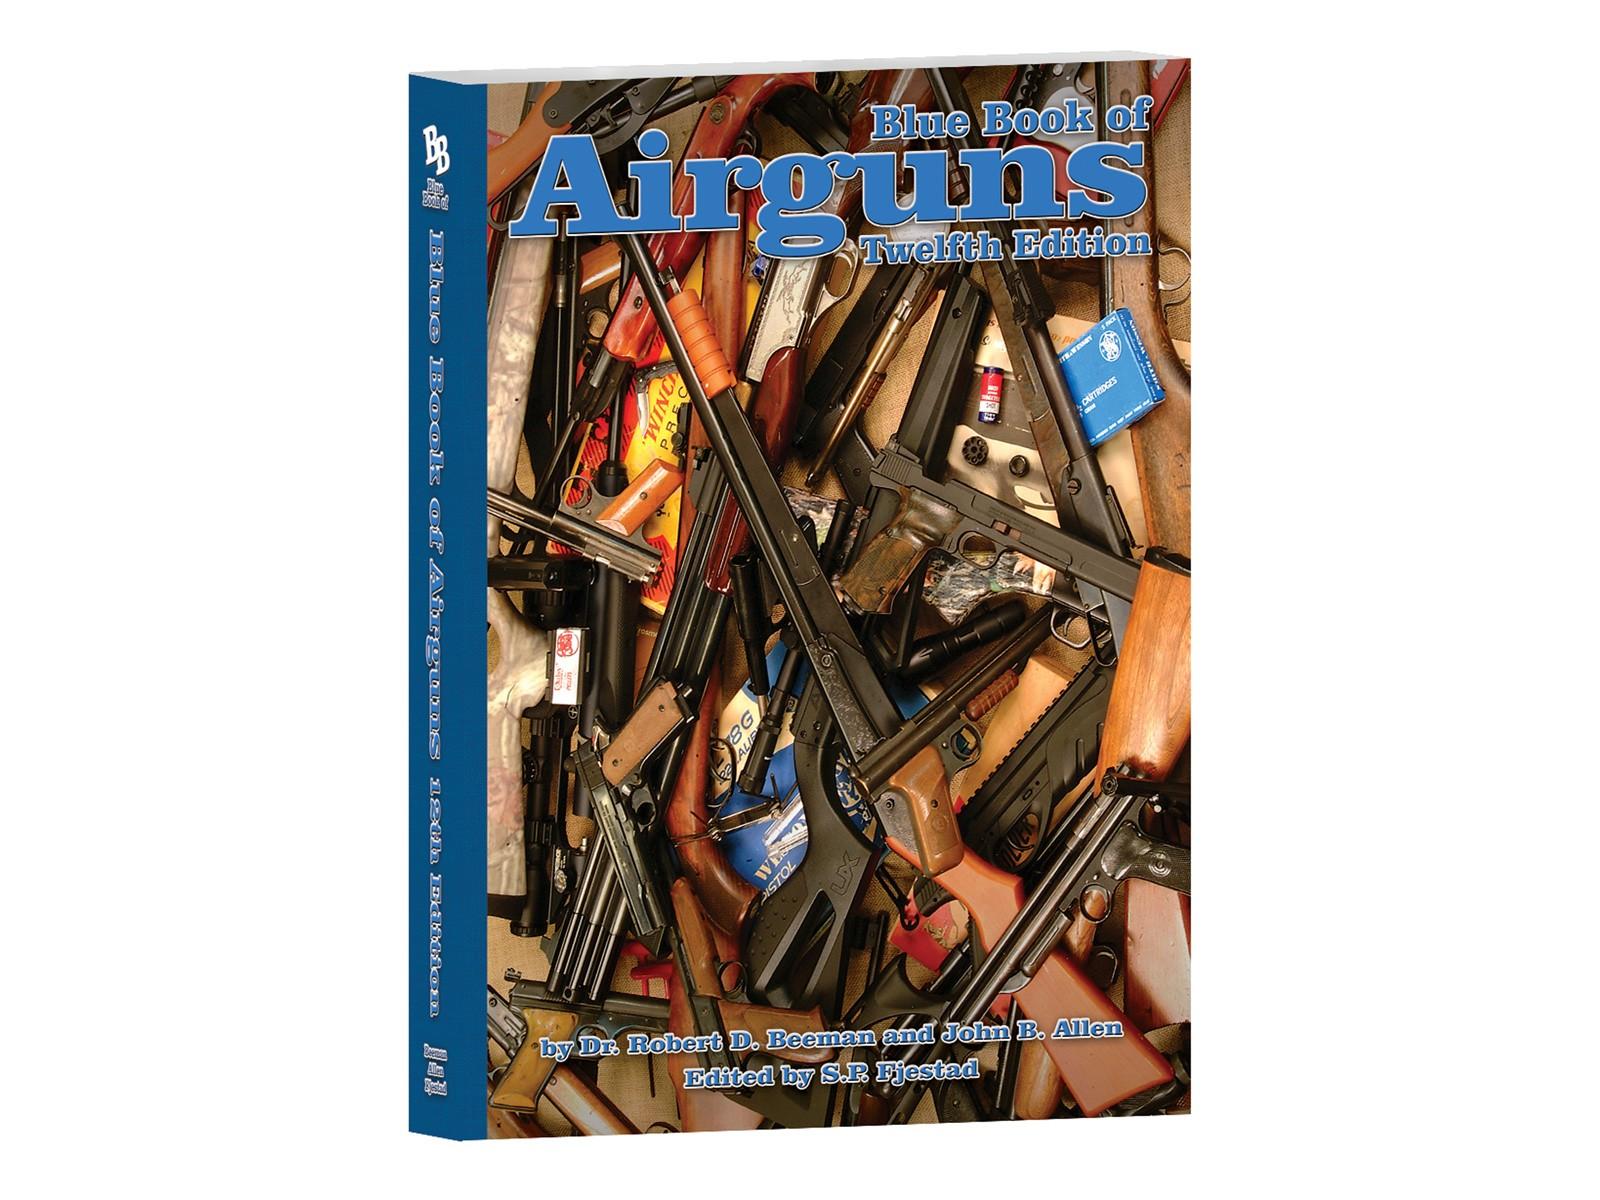 Blue Book of Airguns, 12th Edition